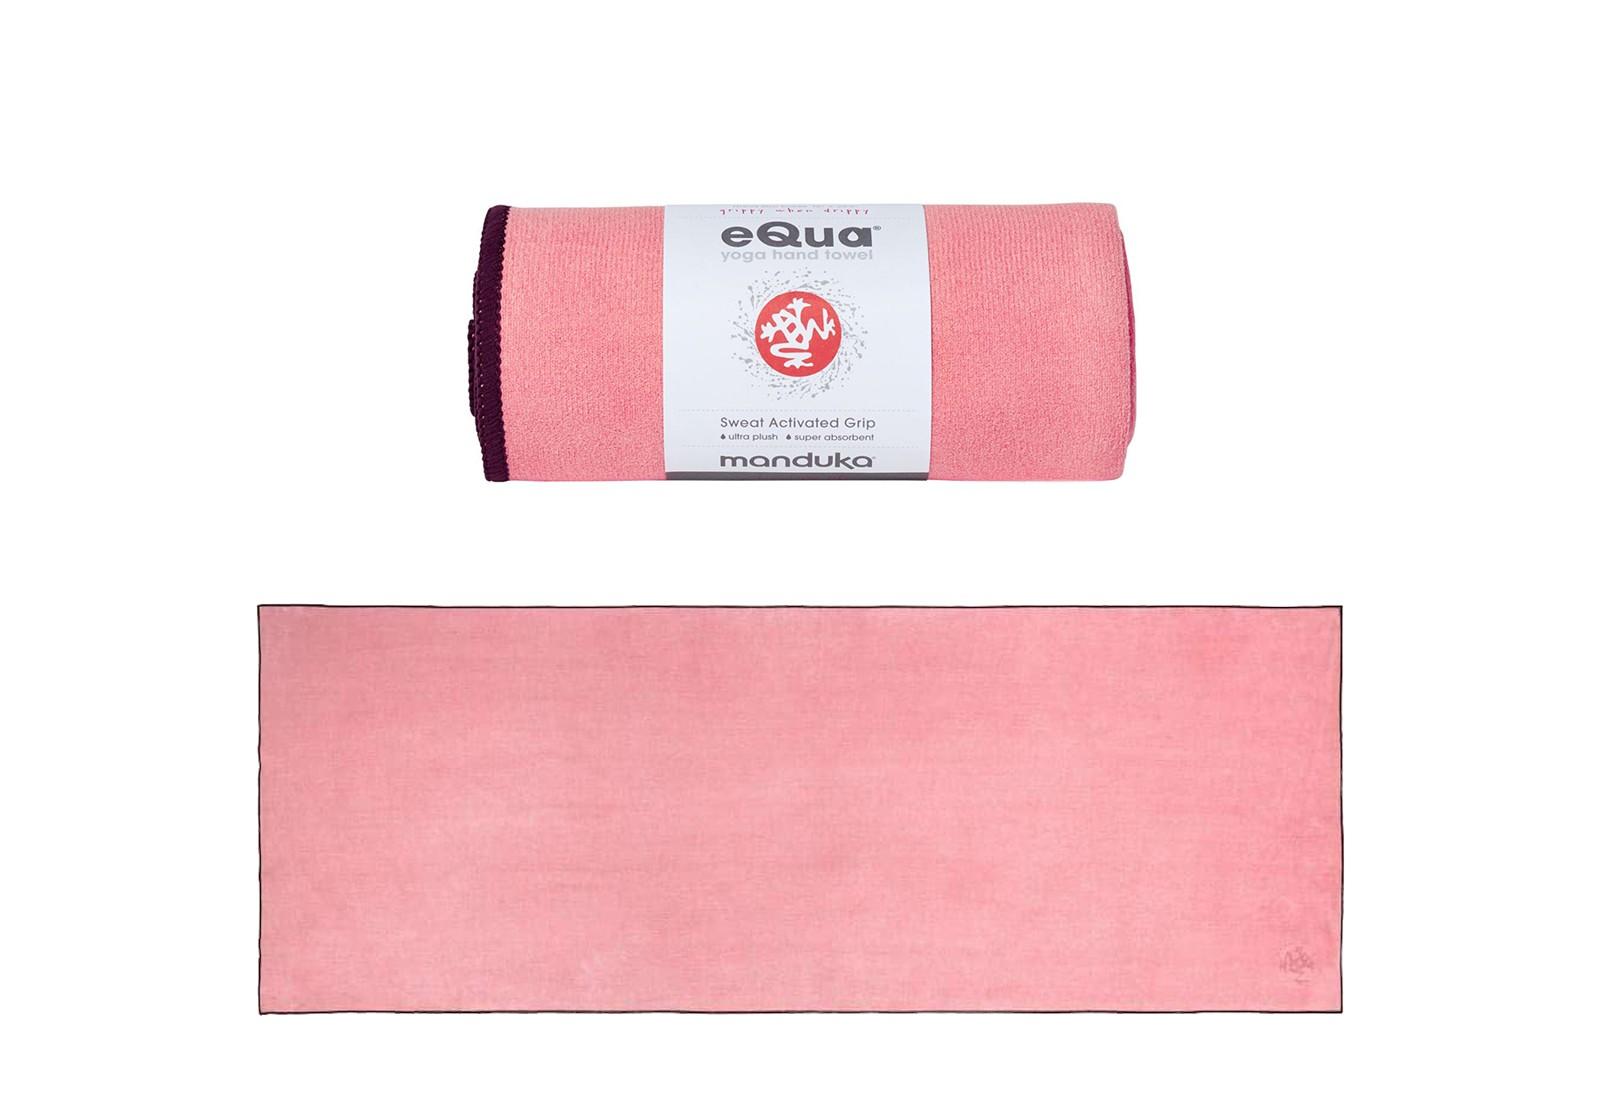 manduka-equa-towel-desert-flower-1